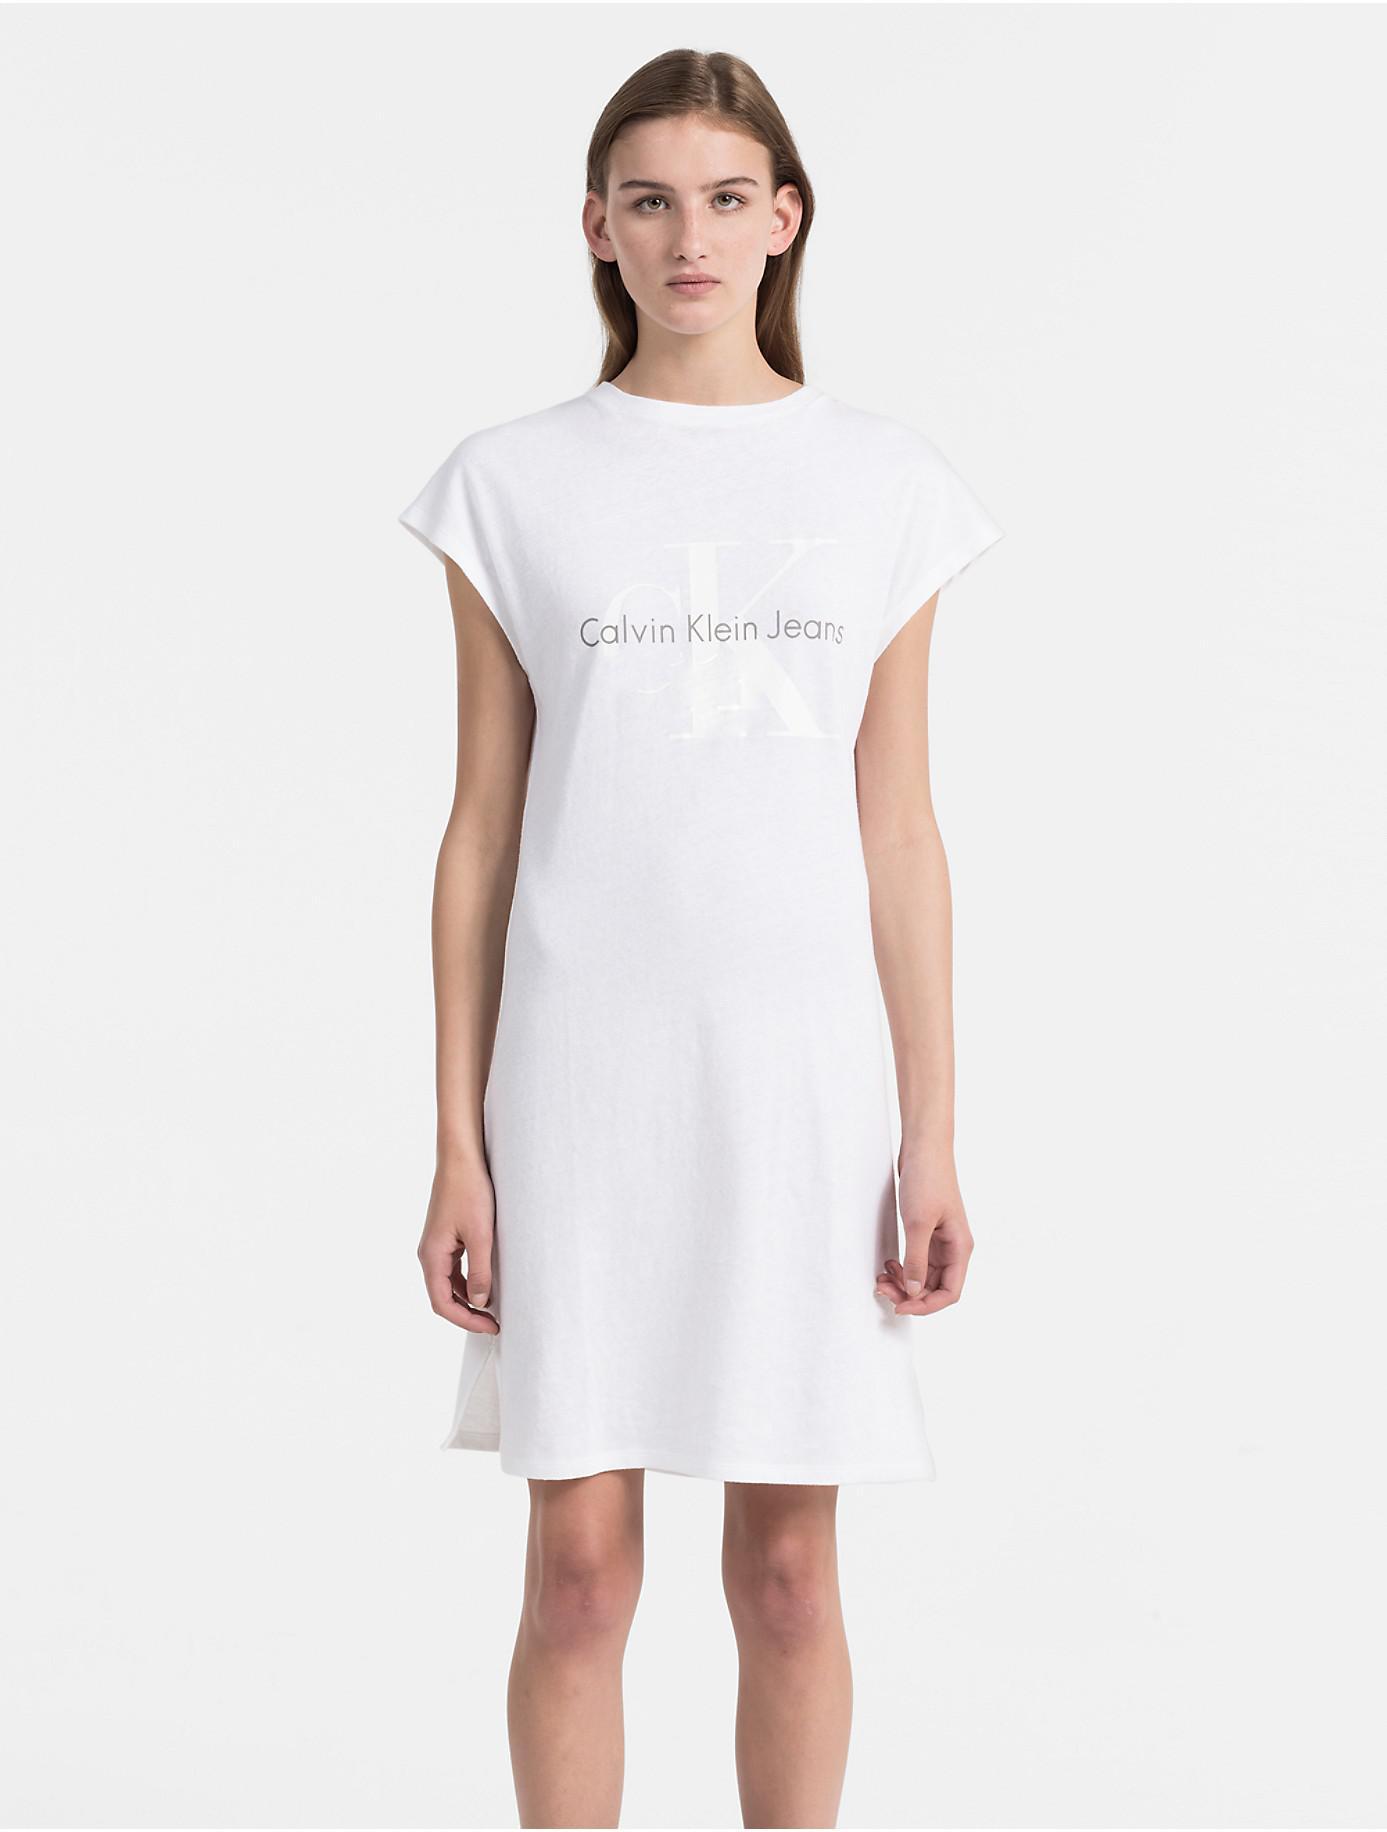 Lyst - Calvin Klein 205W39Nyc Monogram Logo T-shirt Dress in White 78f4f65336